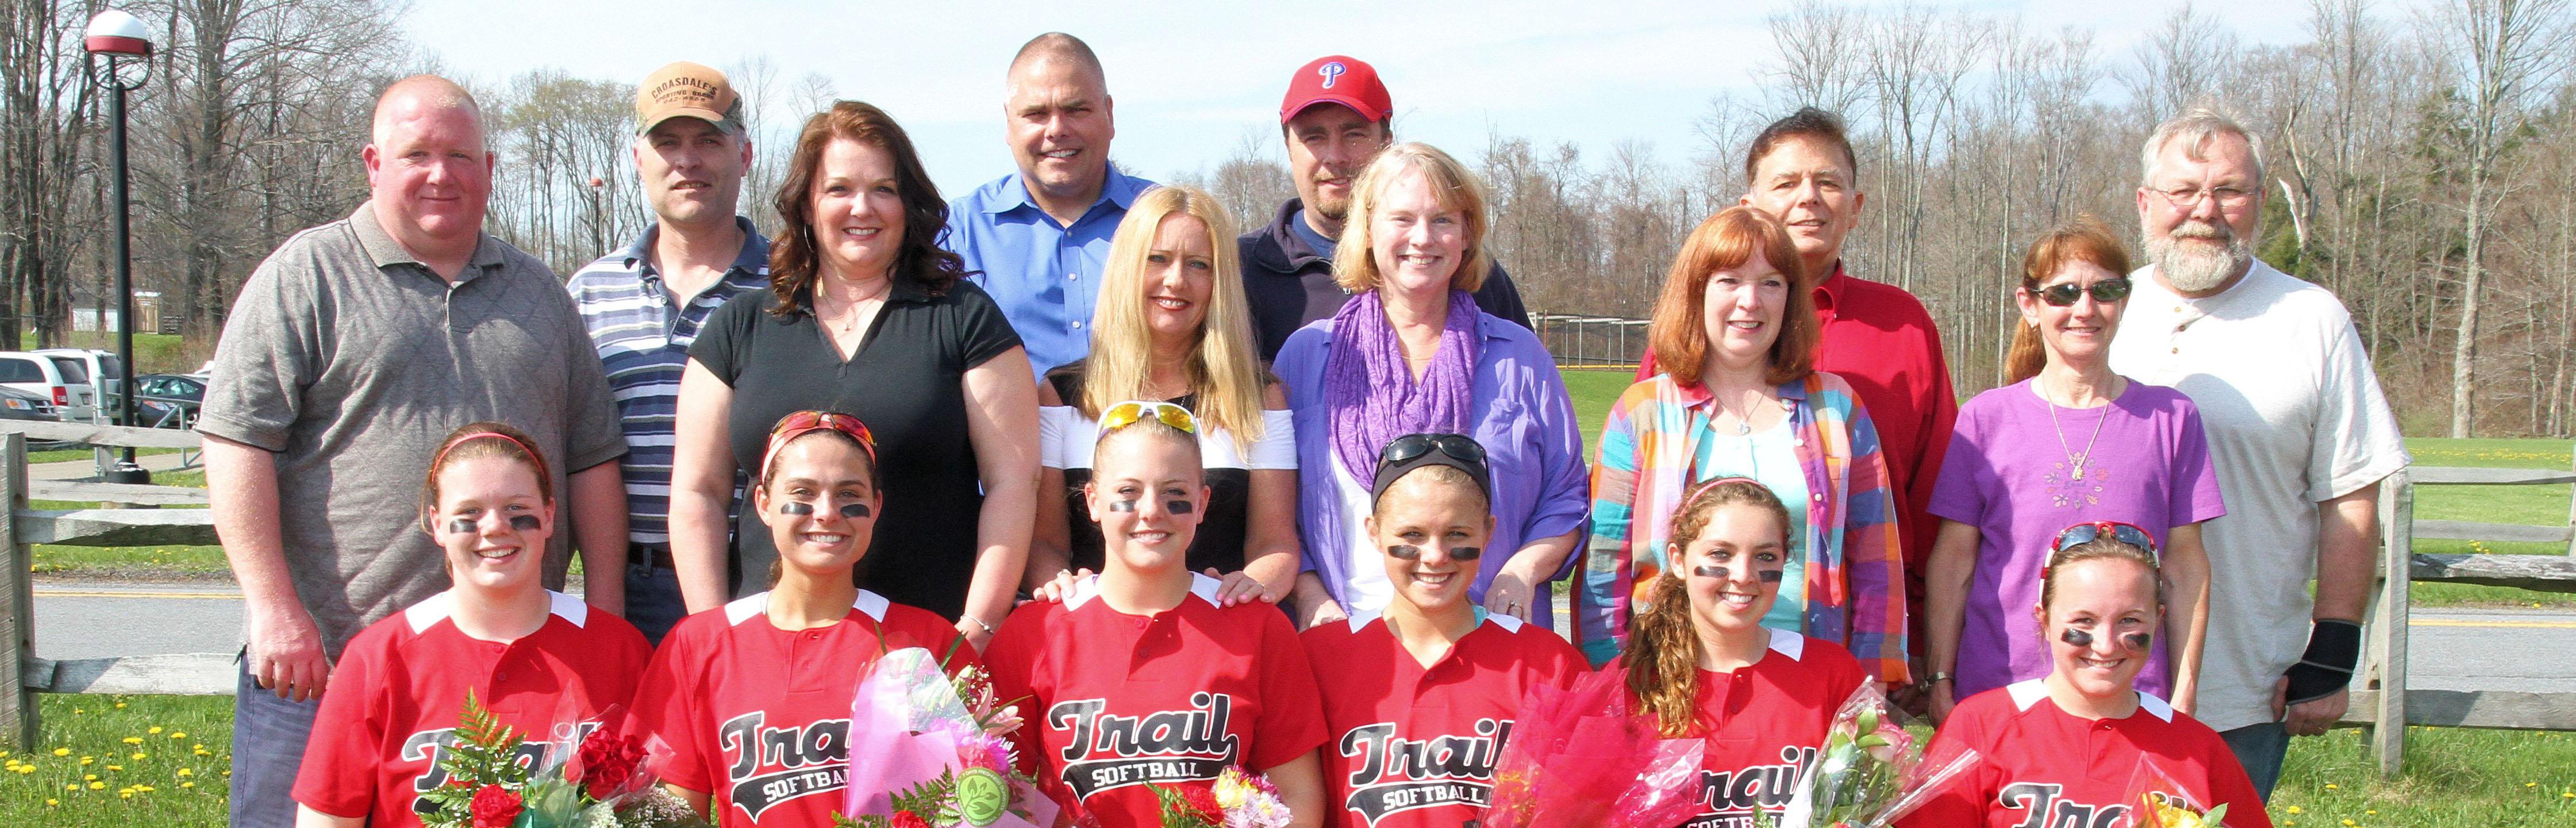 Trail softball Parents